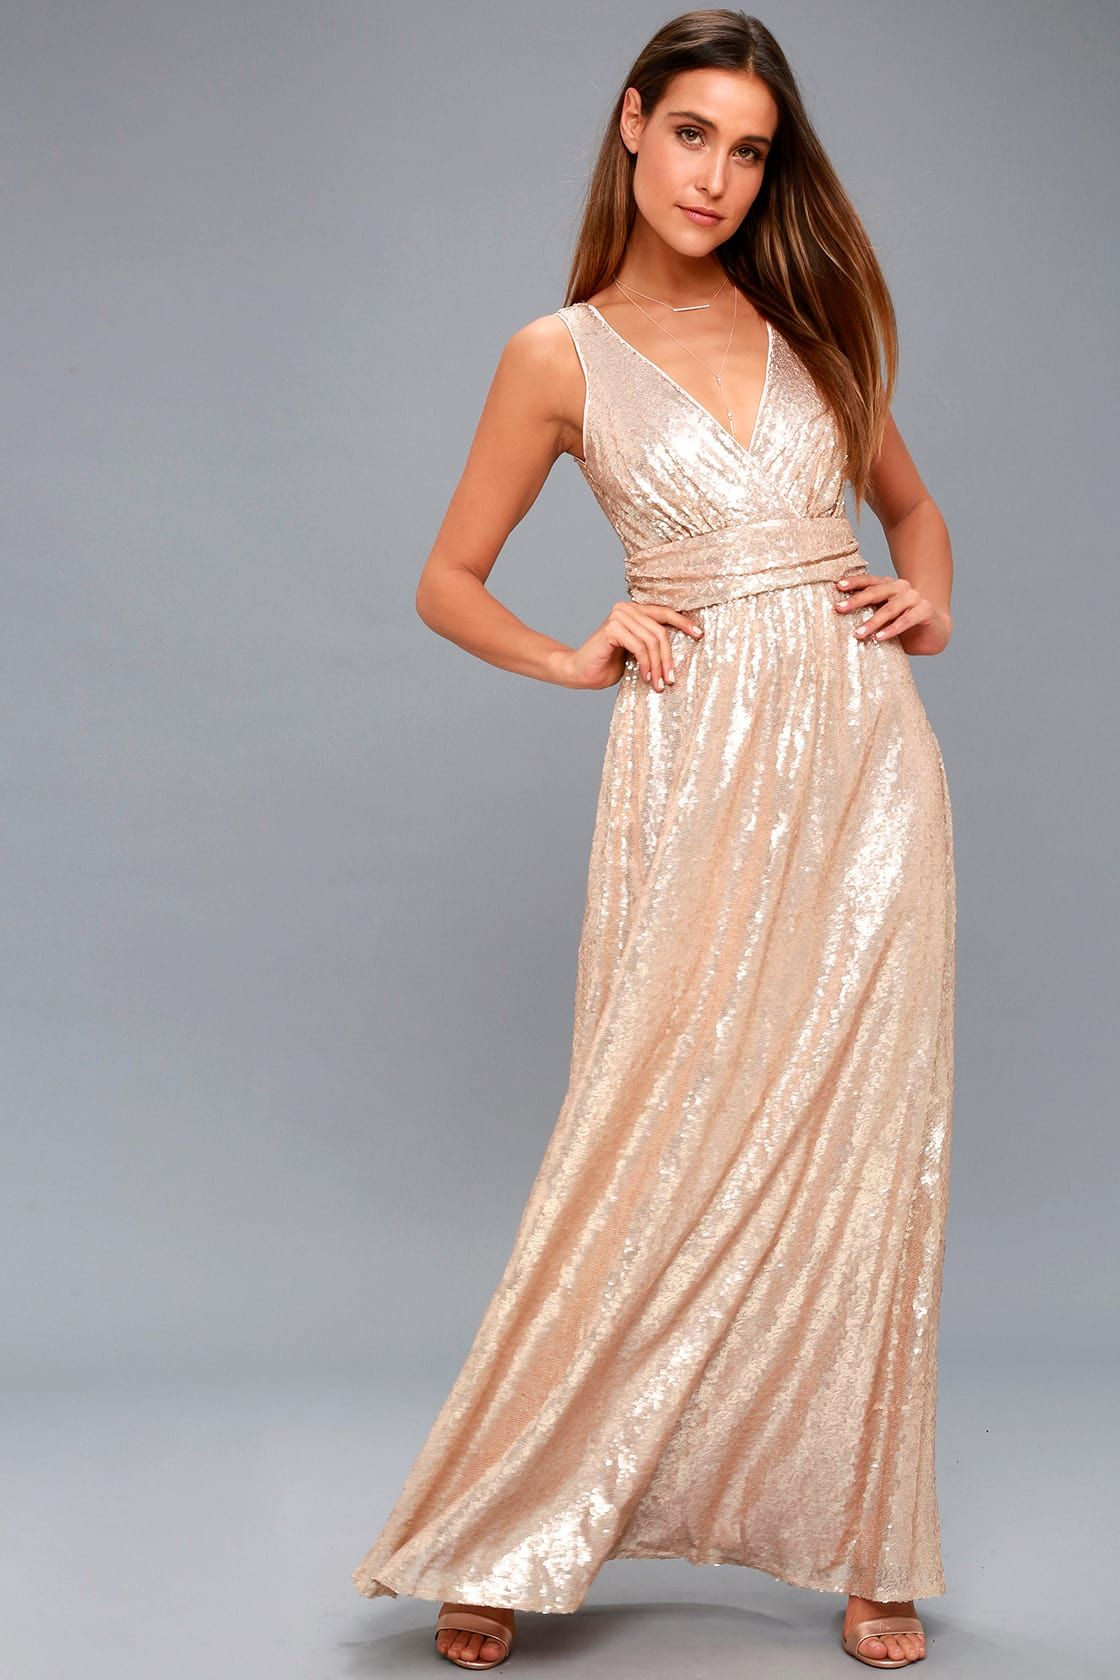 Fan Favorite Matte Rose Gold Sequin Maxi Dress Maxi Dress Womens Formal Gowns Sparkly Dress [ 1680 x 1120 Pixel ]